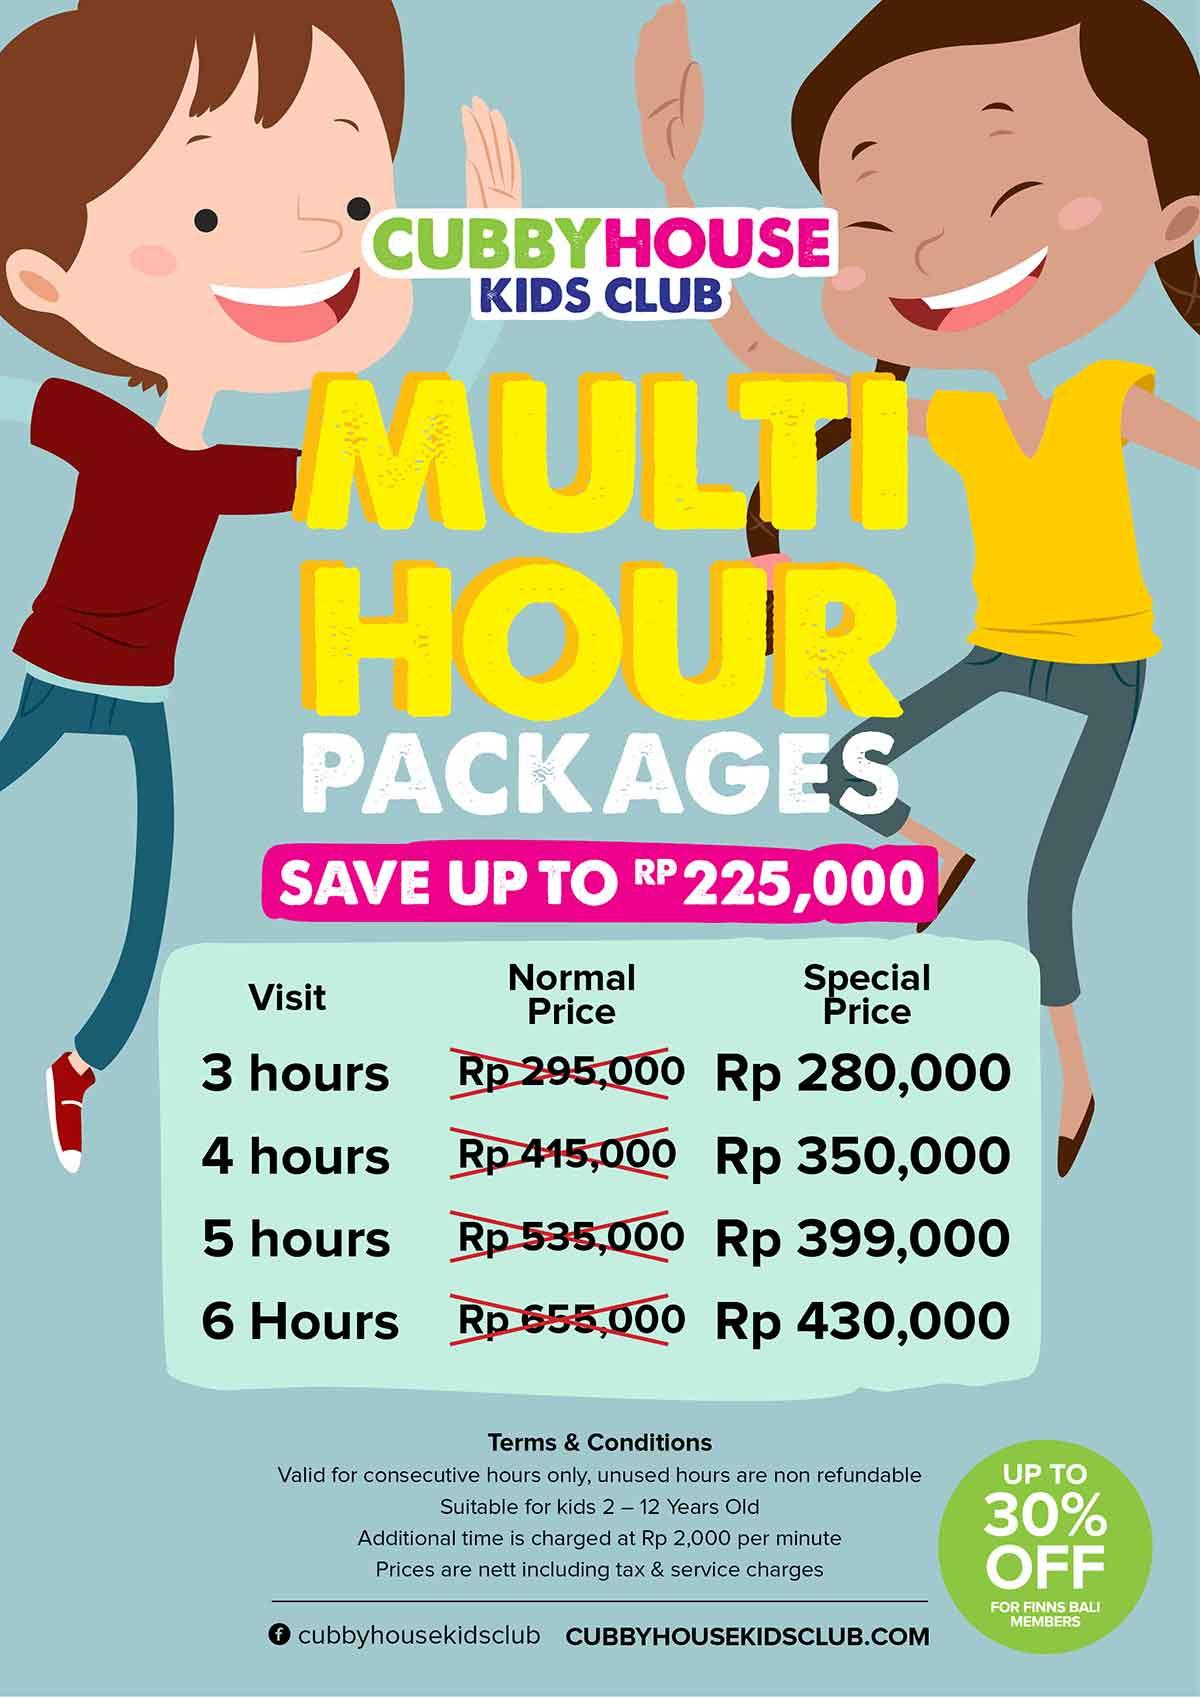 Cubby House Kids Club Bali Multi Hour